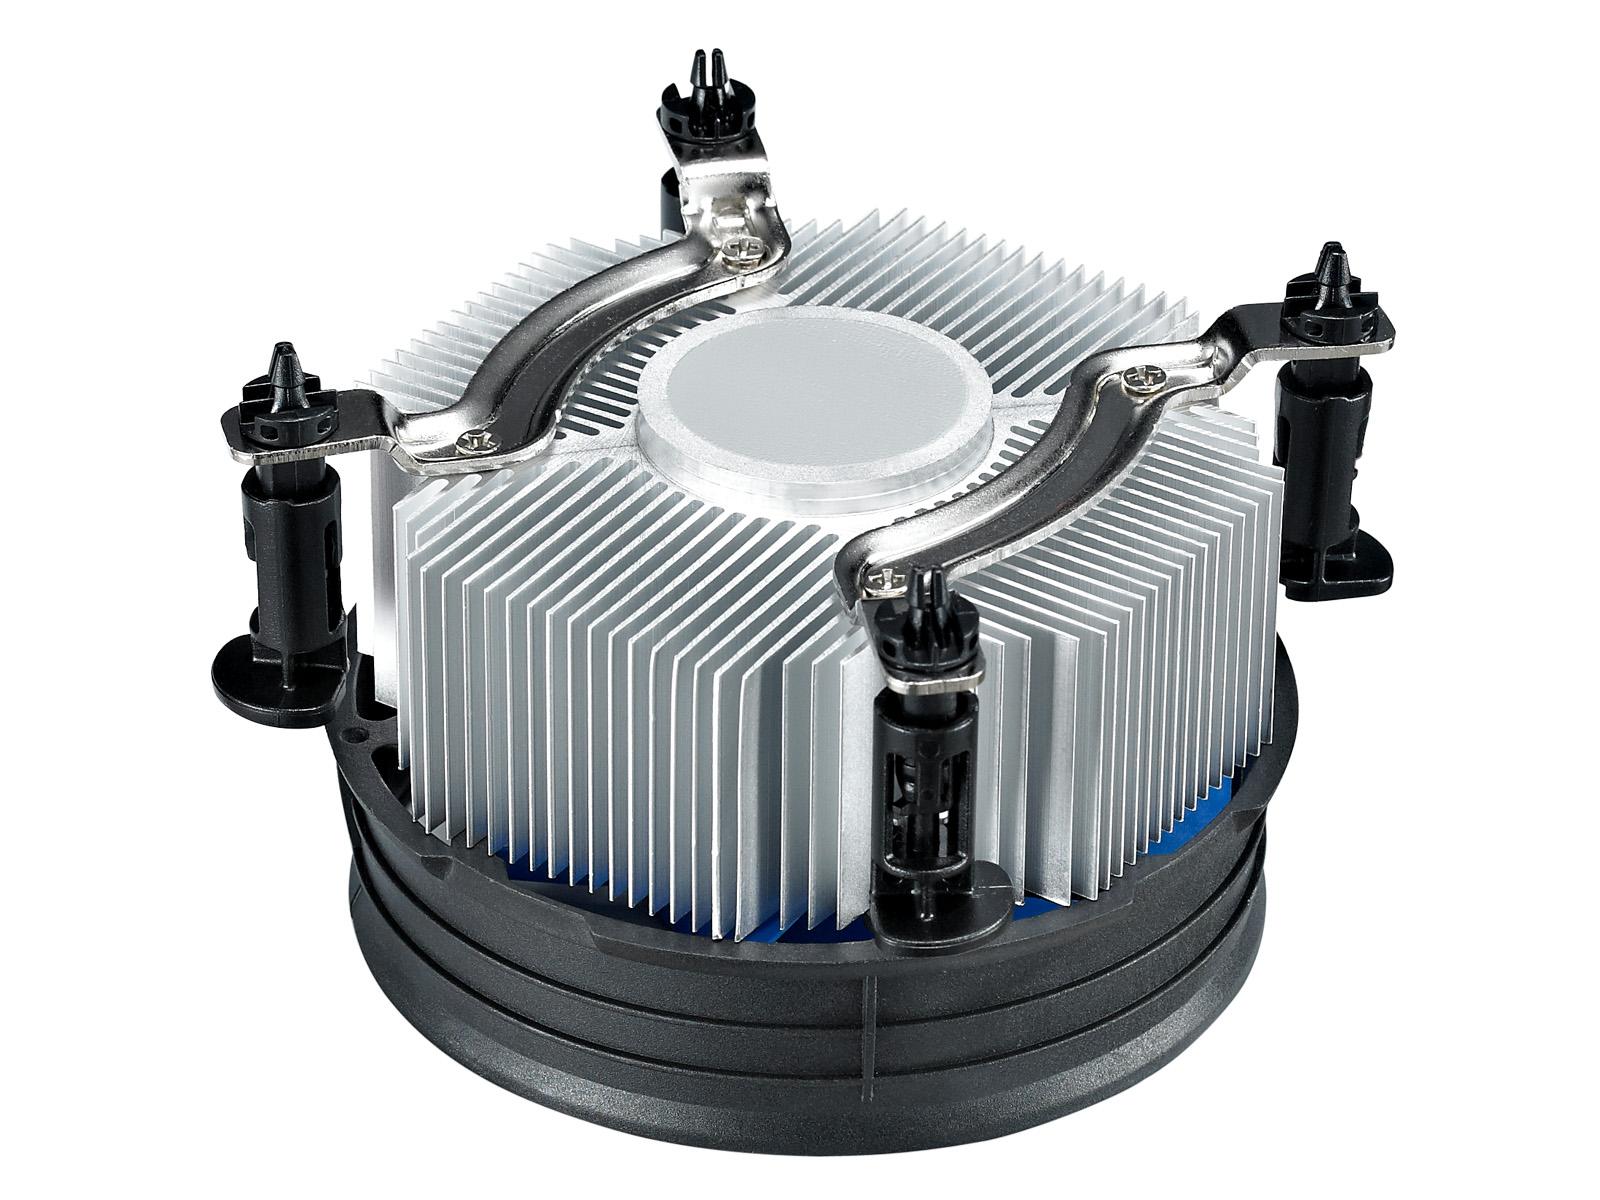 LGA-1150/1151/1155/1156 DeepCool Theta 21